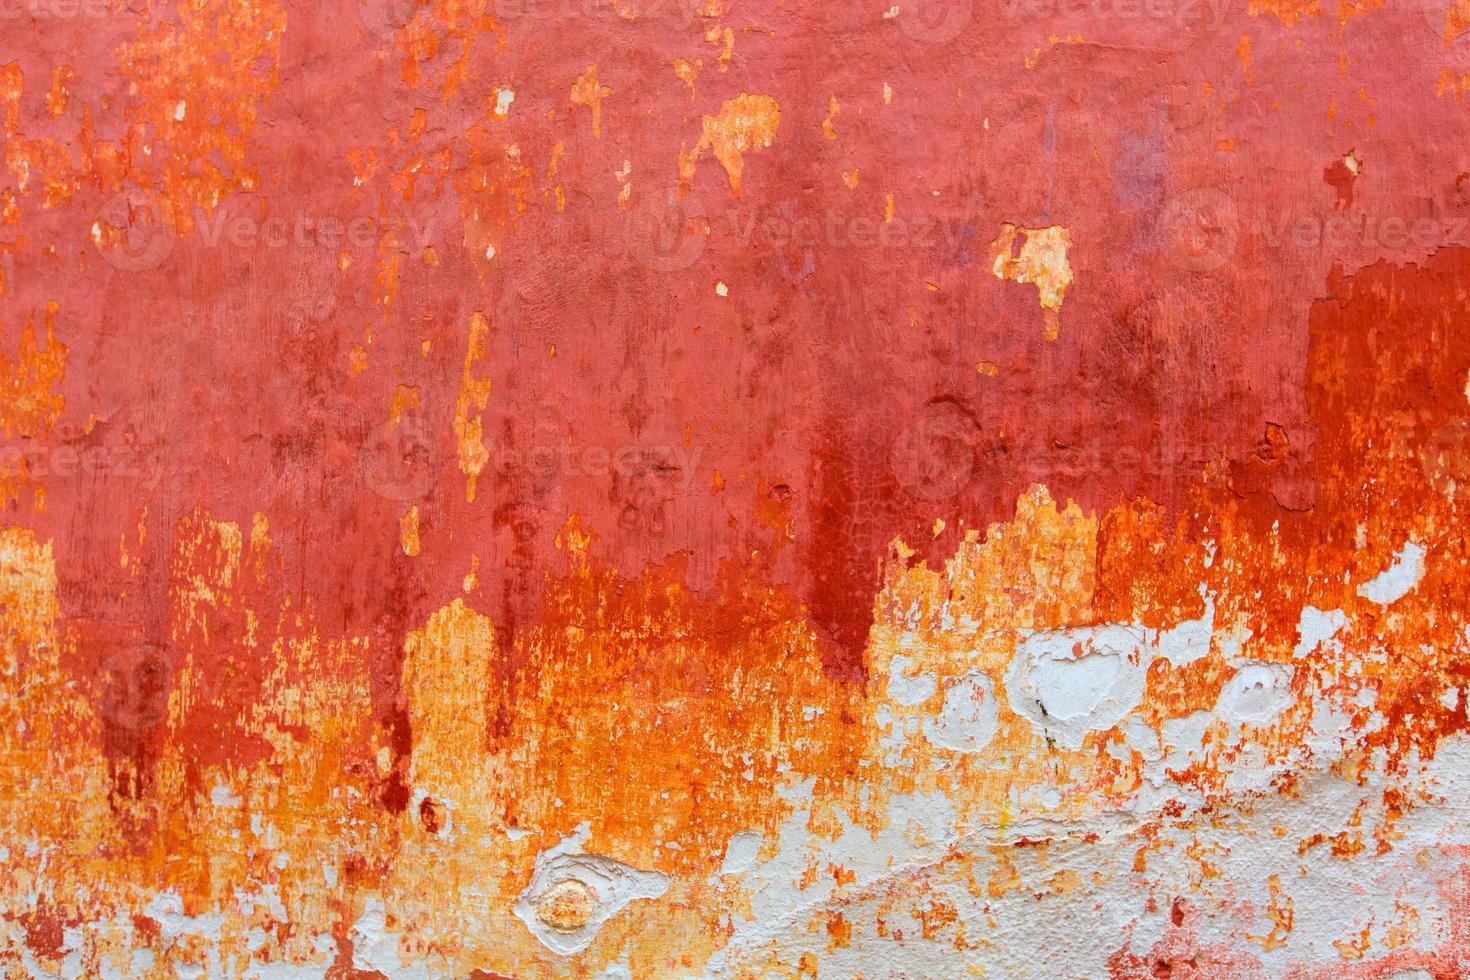 Menorca Ciutadella rote Grunge Fassade Textur foto